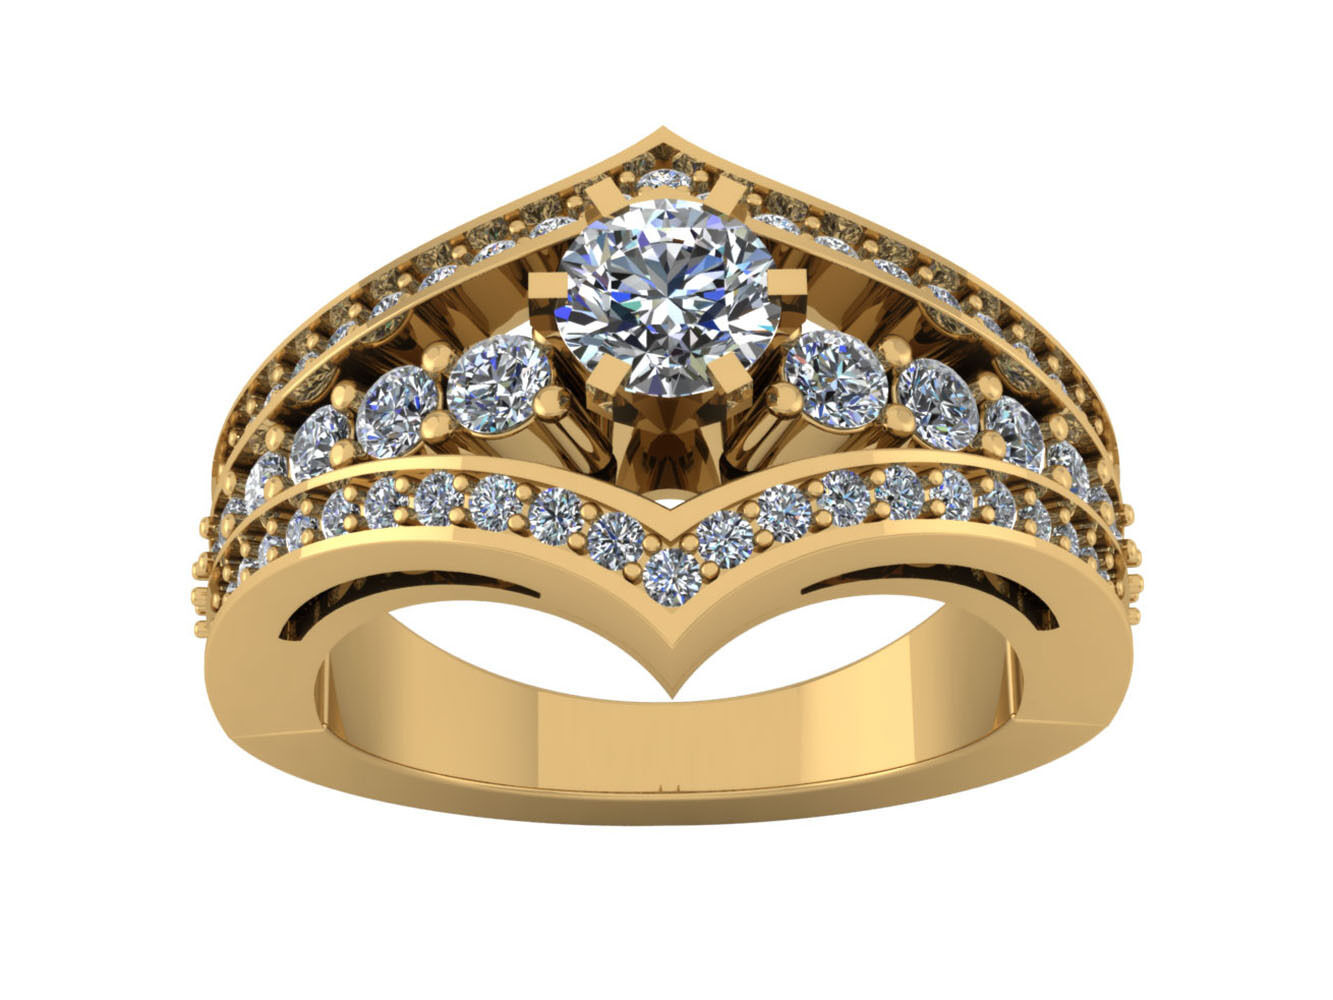 1.50Ct Round Cut Diamond Contemporary Bridal Engagement Ring Soild 14k gold